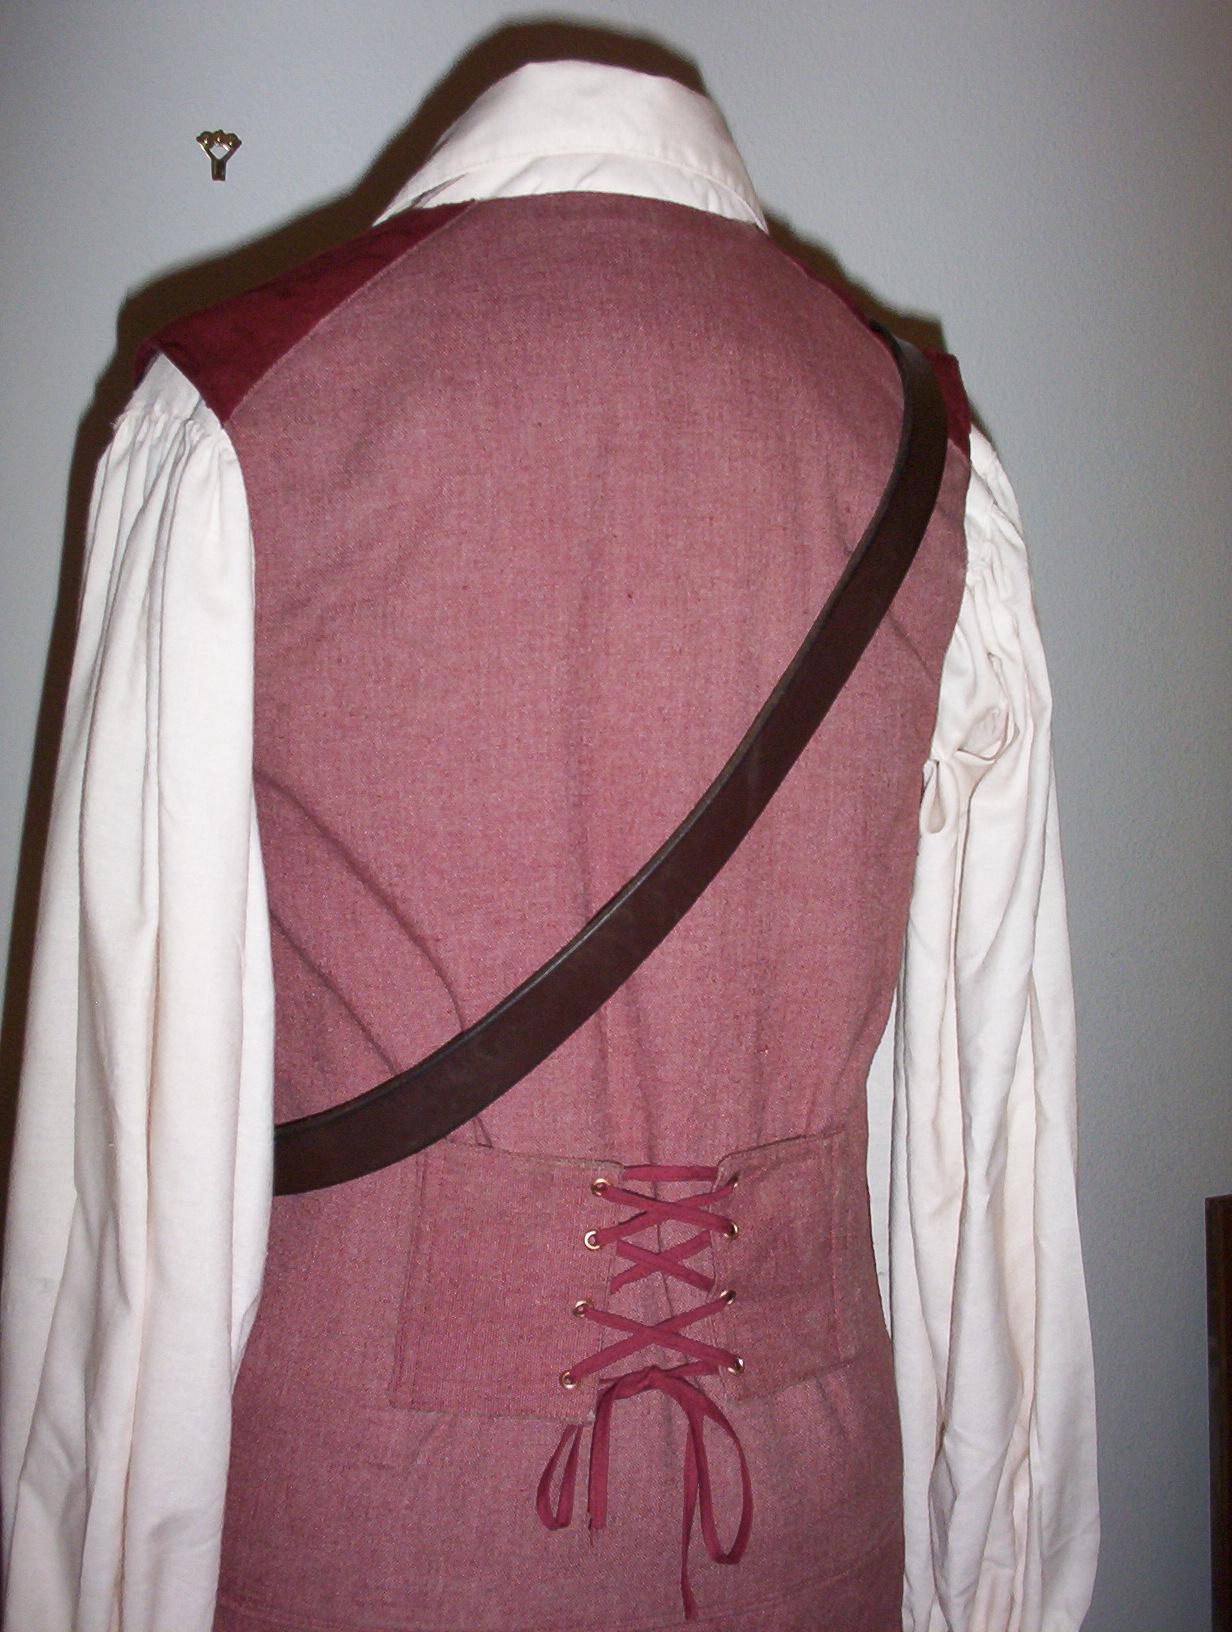 Pirate costume2 018.jpg